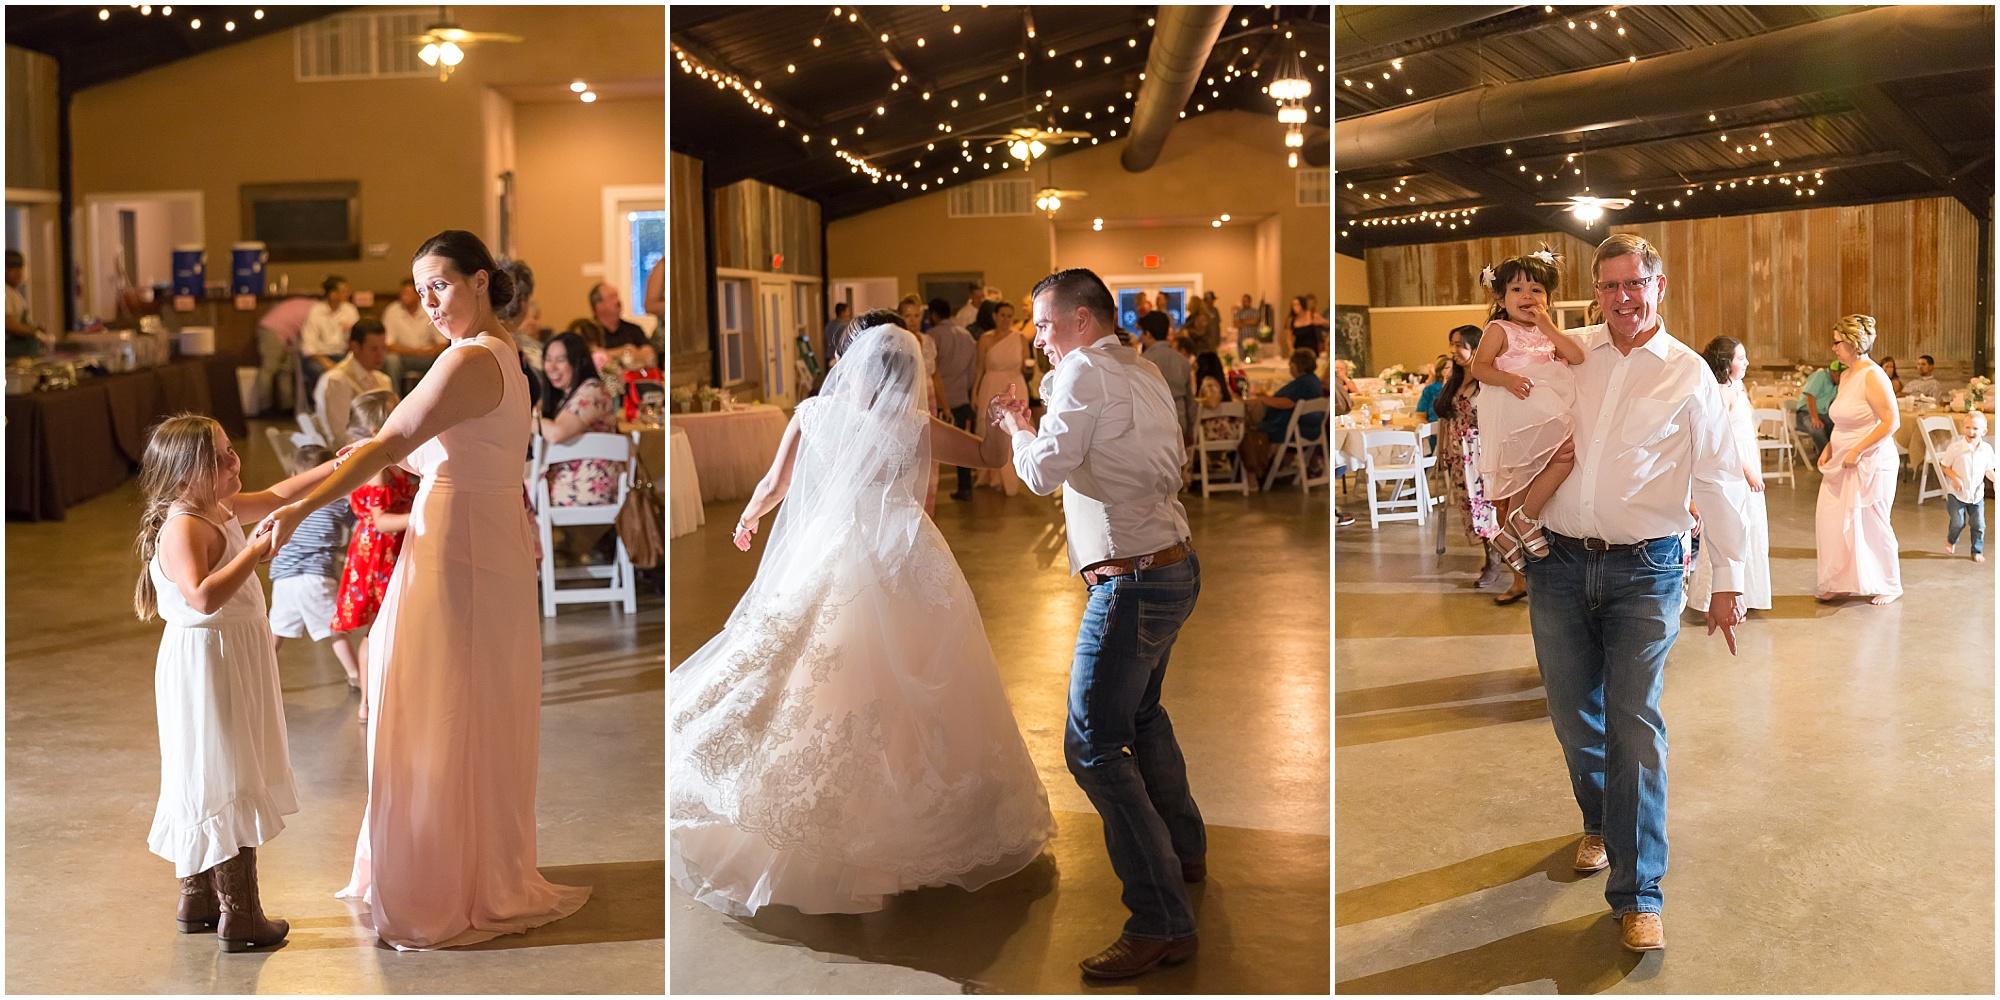 Belton-Texas-Rustic-Wedding_0041.jpg